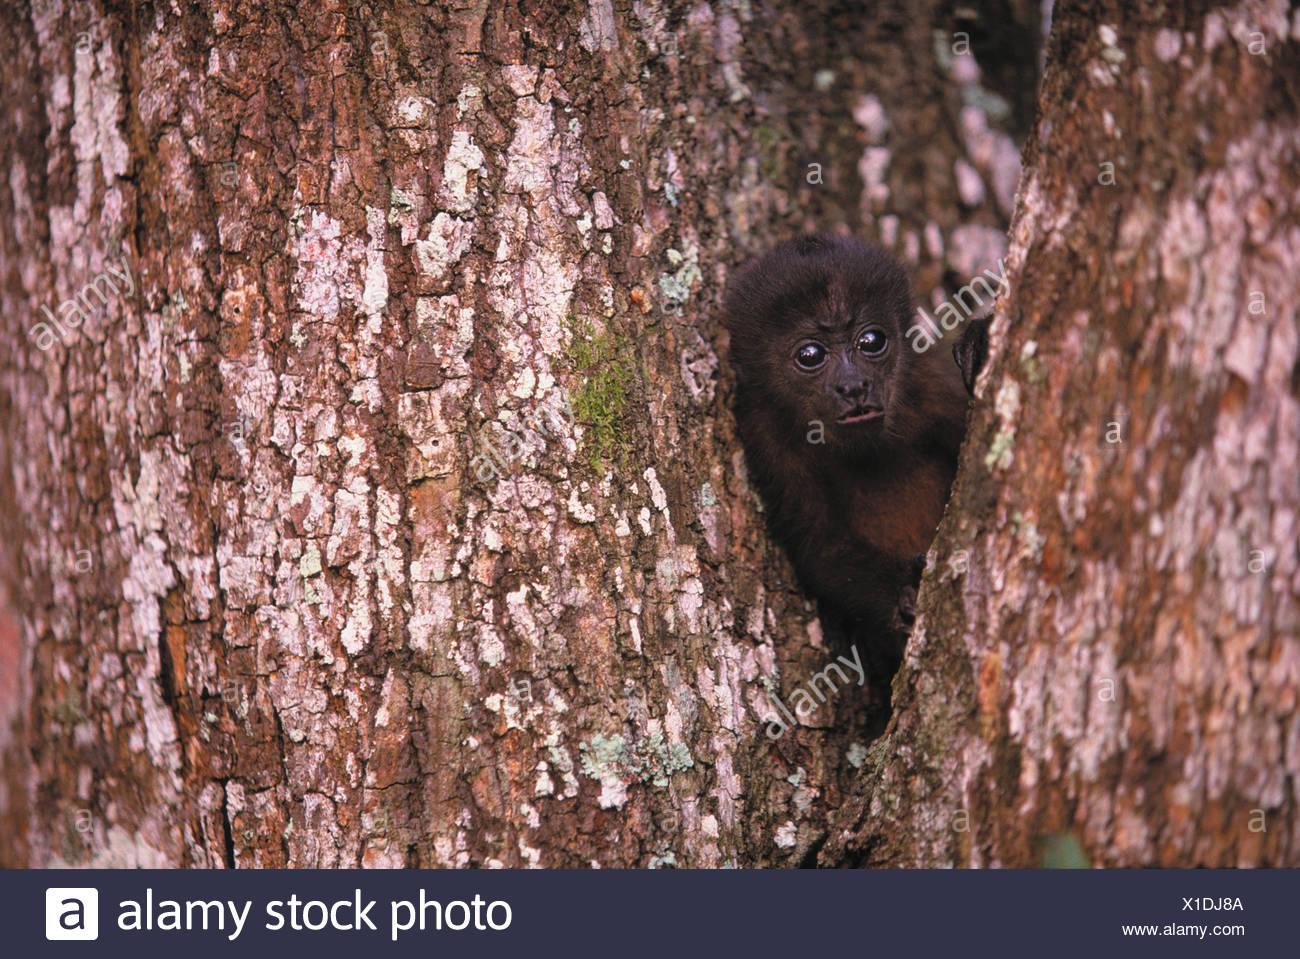 Black Howler Monkey, Islas Bocas del Toro, Panama - Stock Image